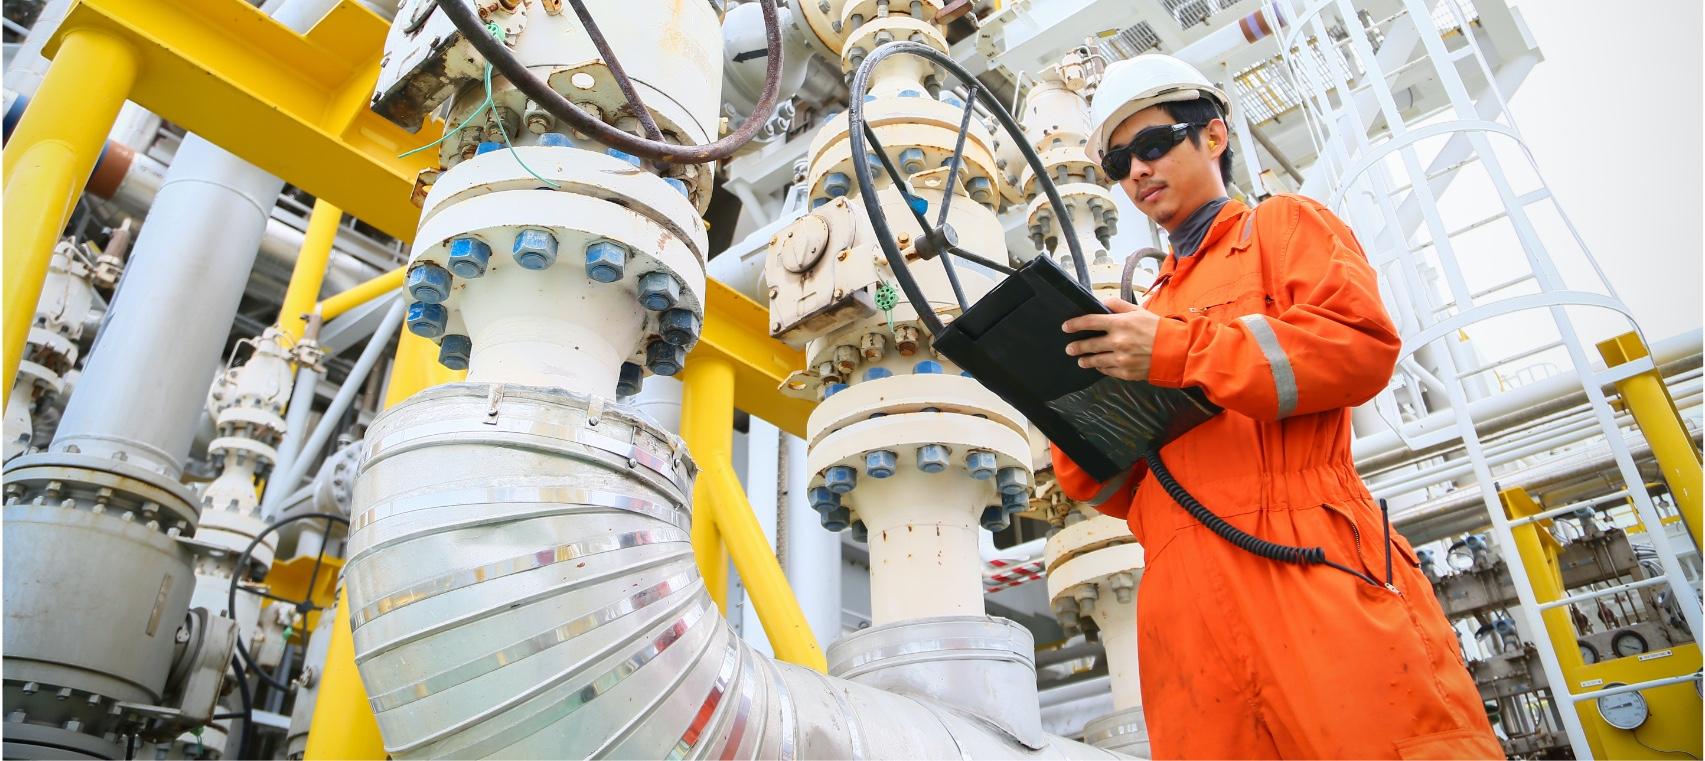 Industrial Training International (ITI) case study